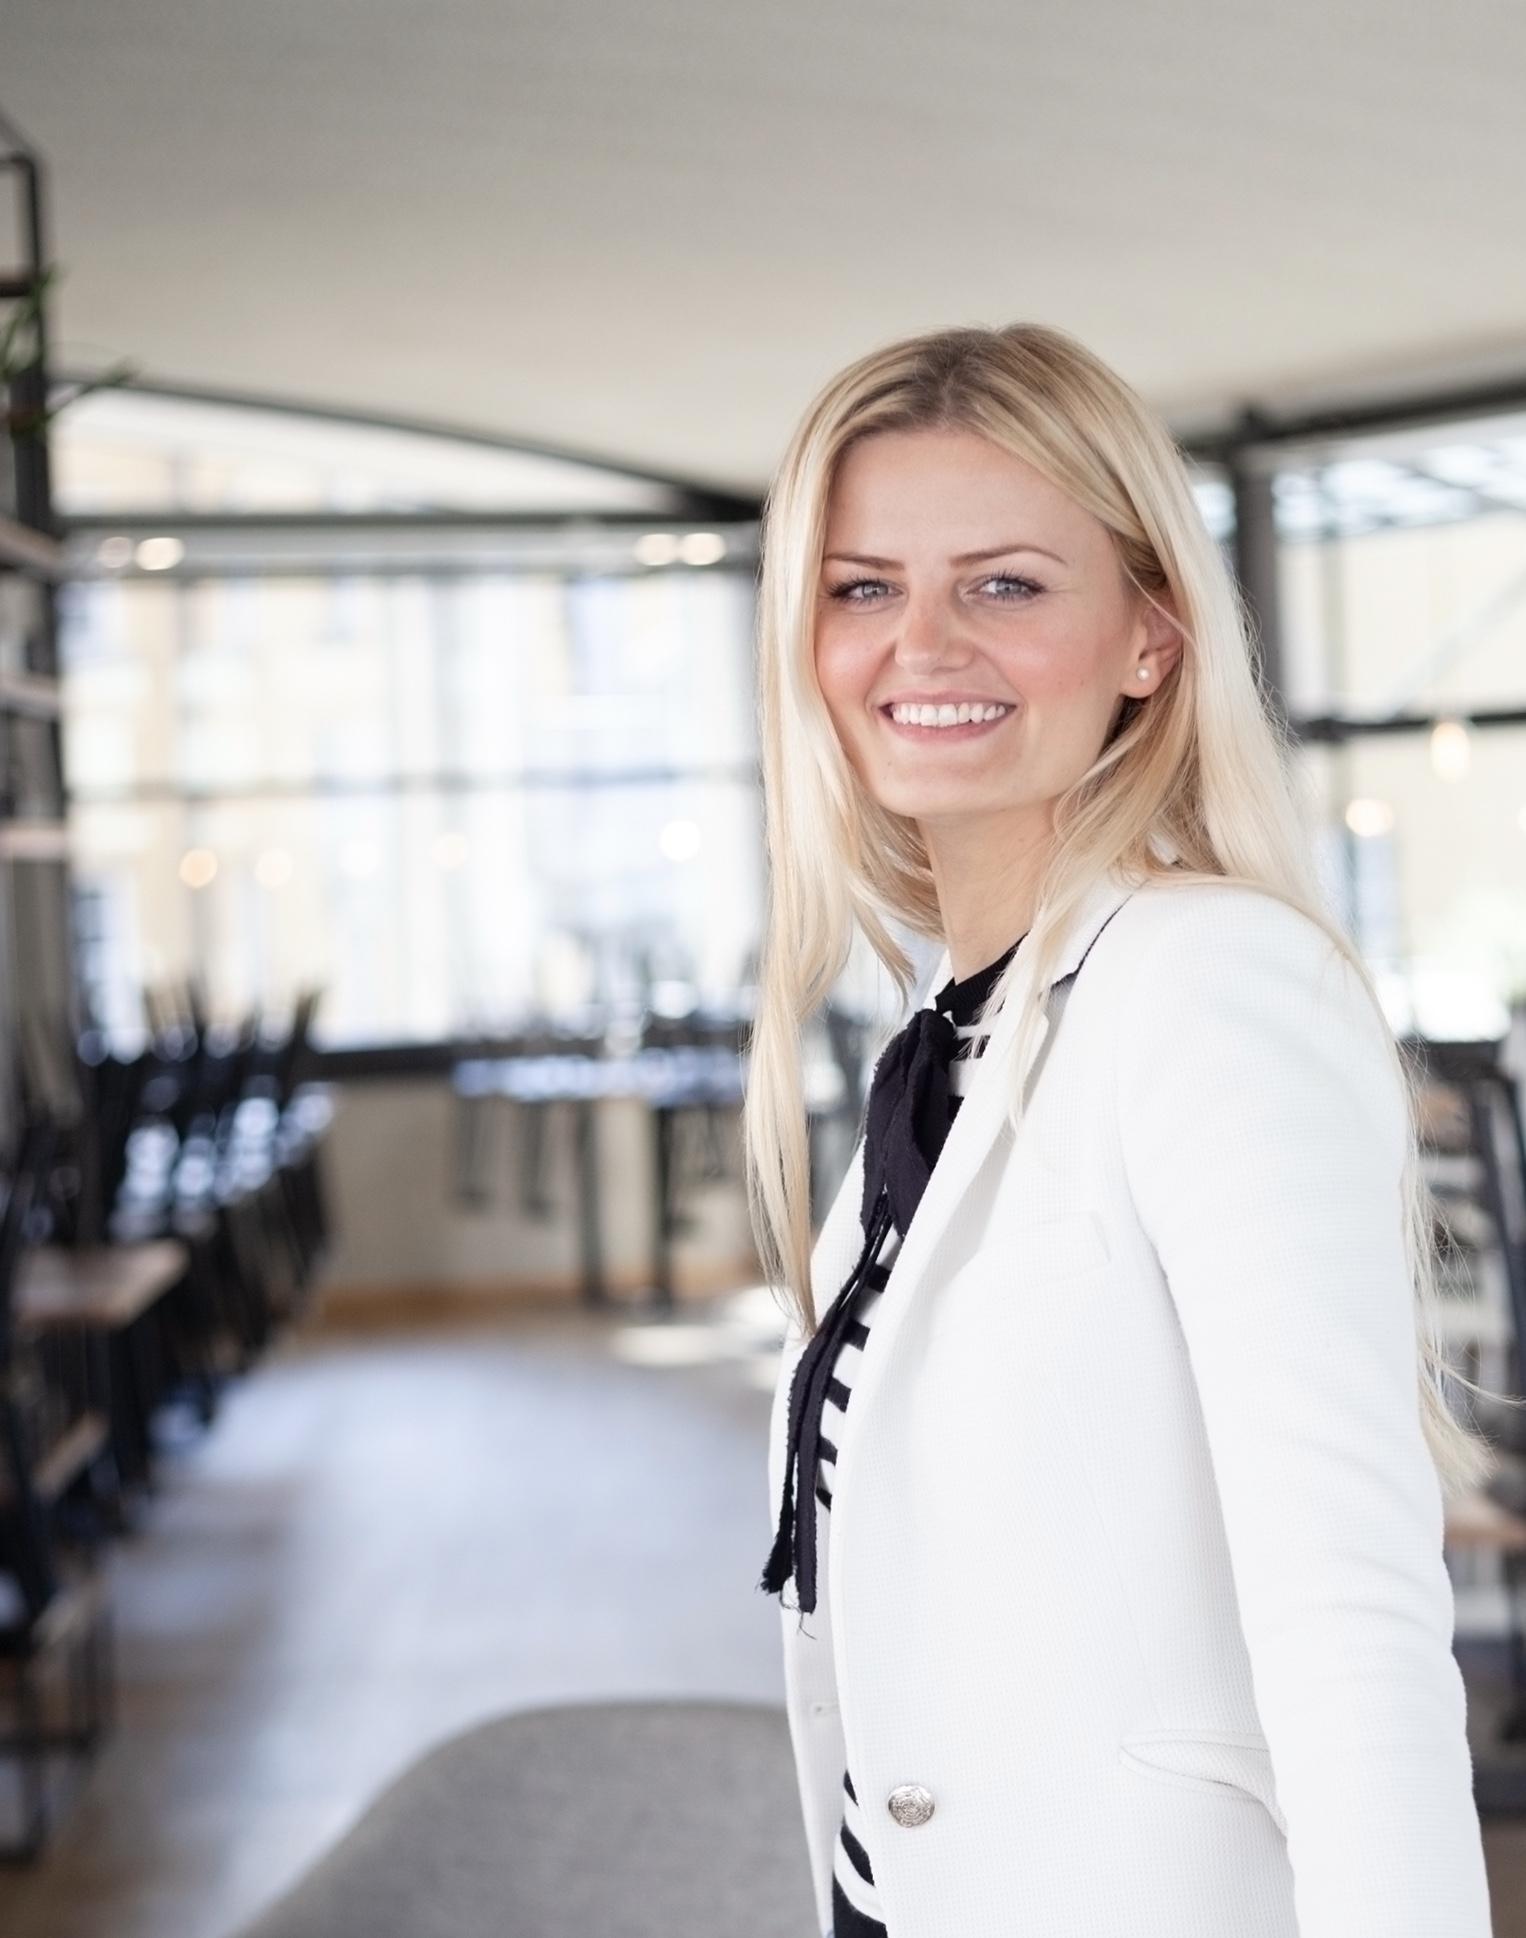 Mirnesa Halitovic Verhandlungsexpertin